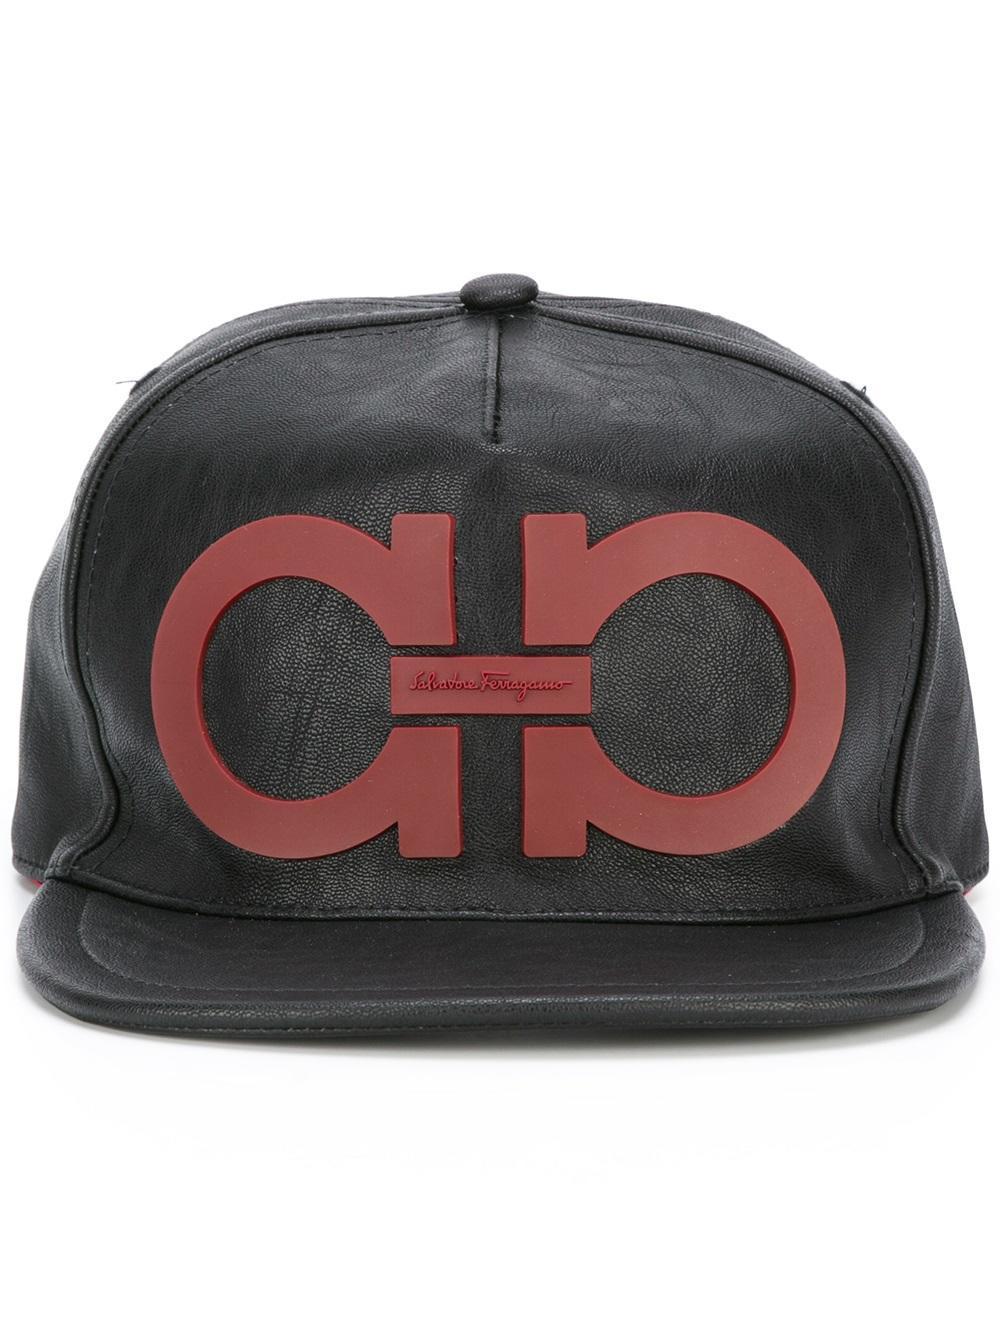 Lyst - Ferragamo Gancini Detail Cap in Black for Men c4a628d63b12